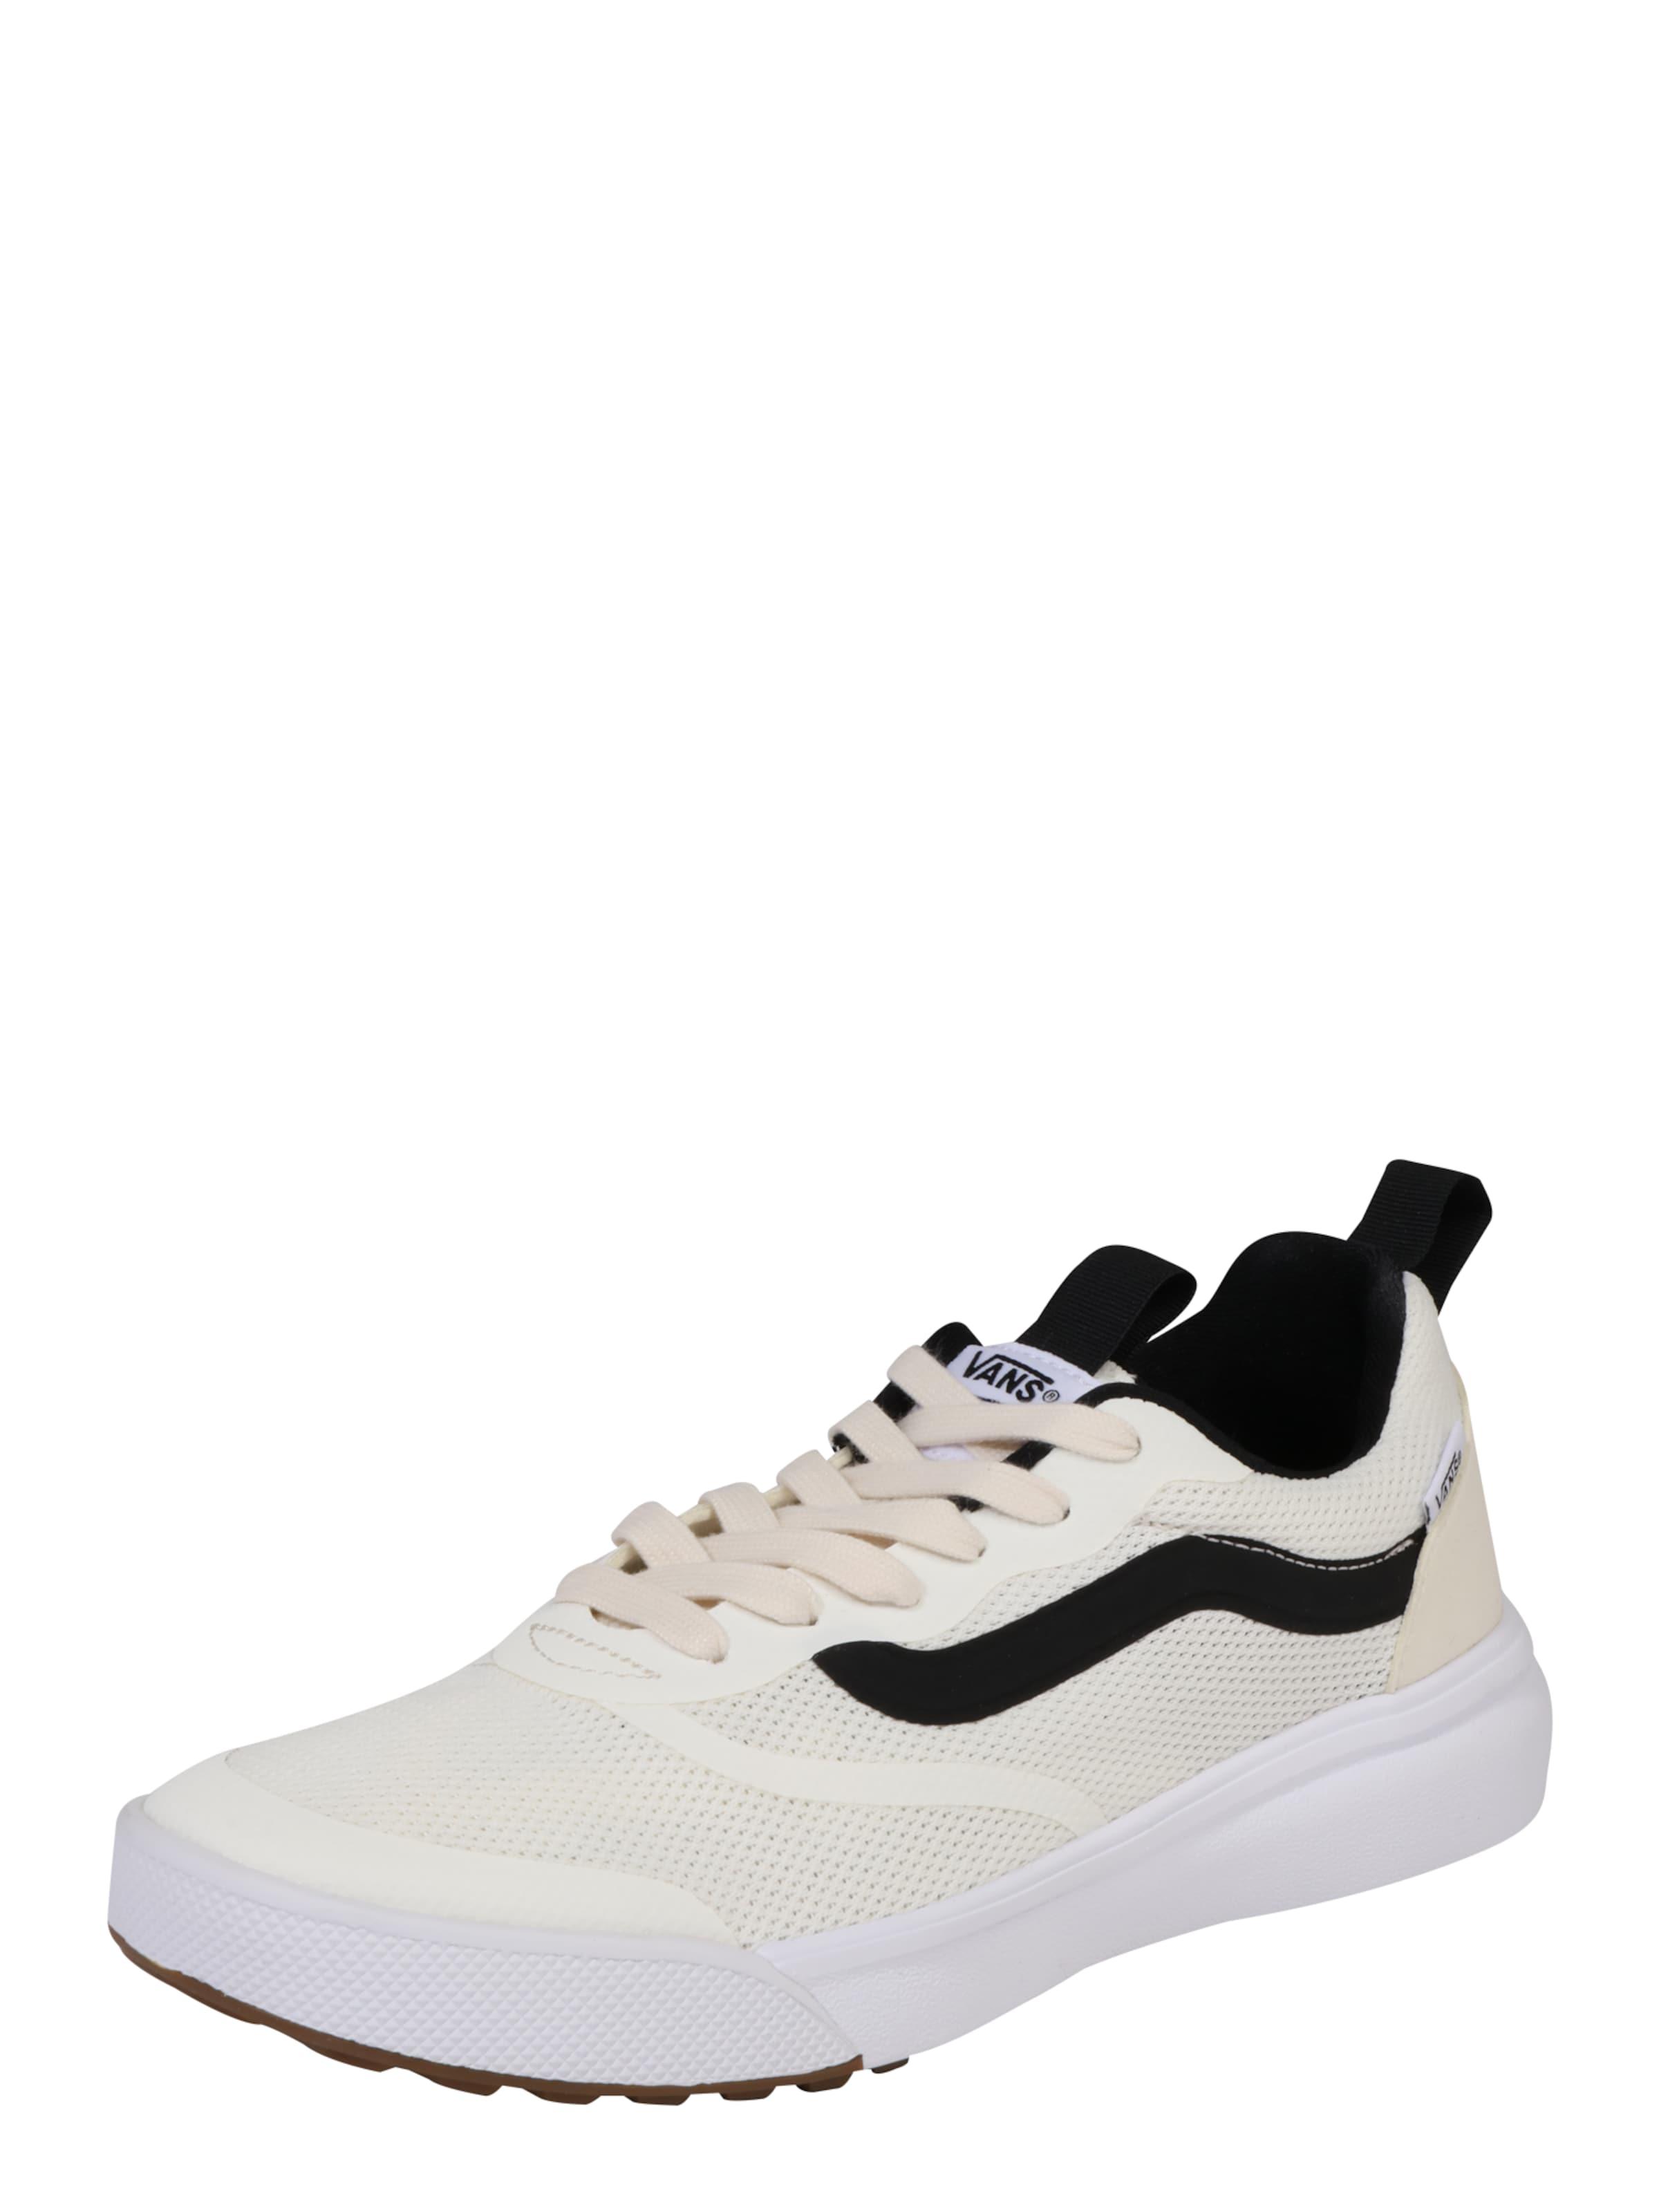 VANS Sneaker UA Ultra Range Hohe Qualität